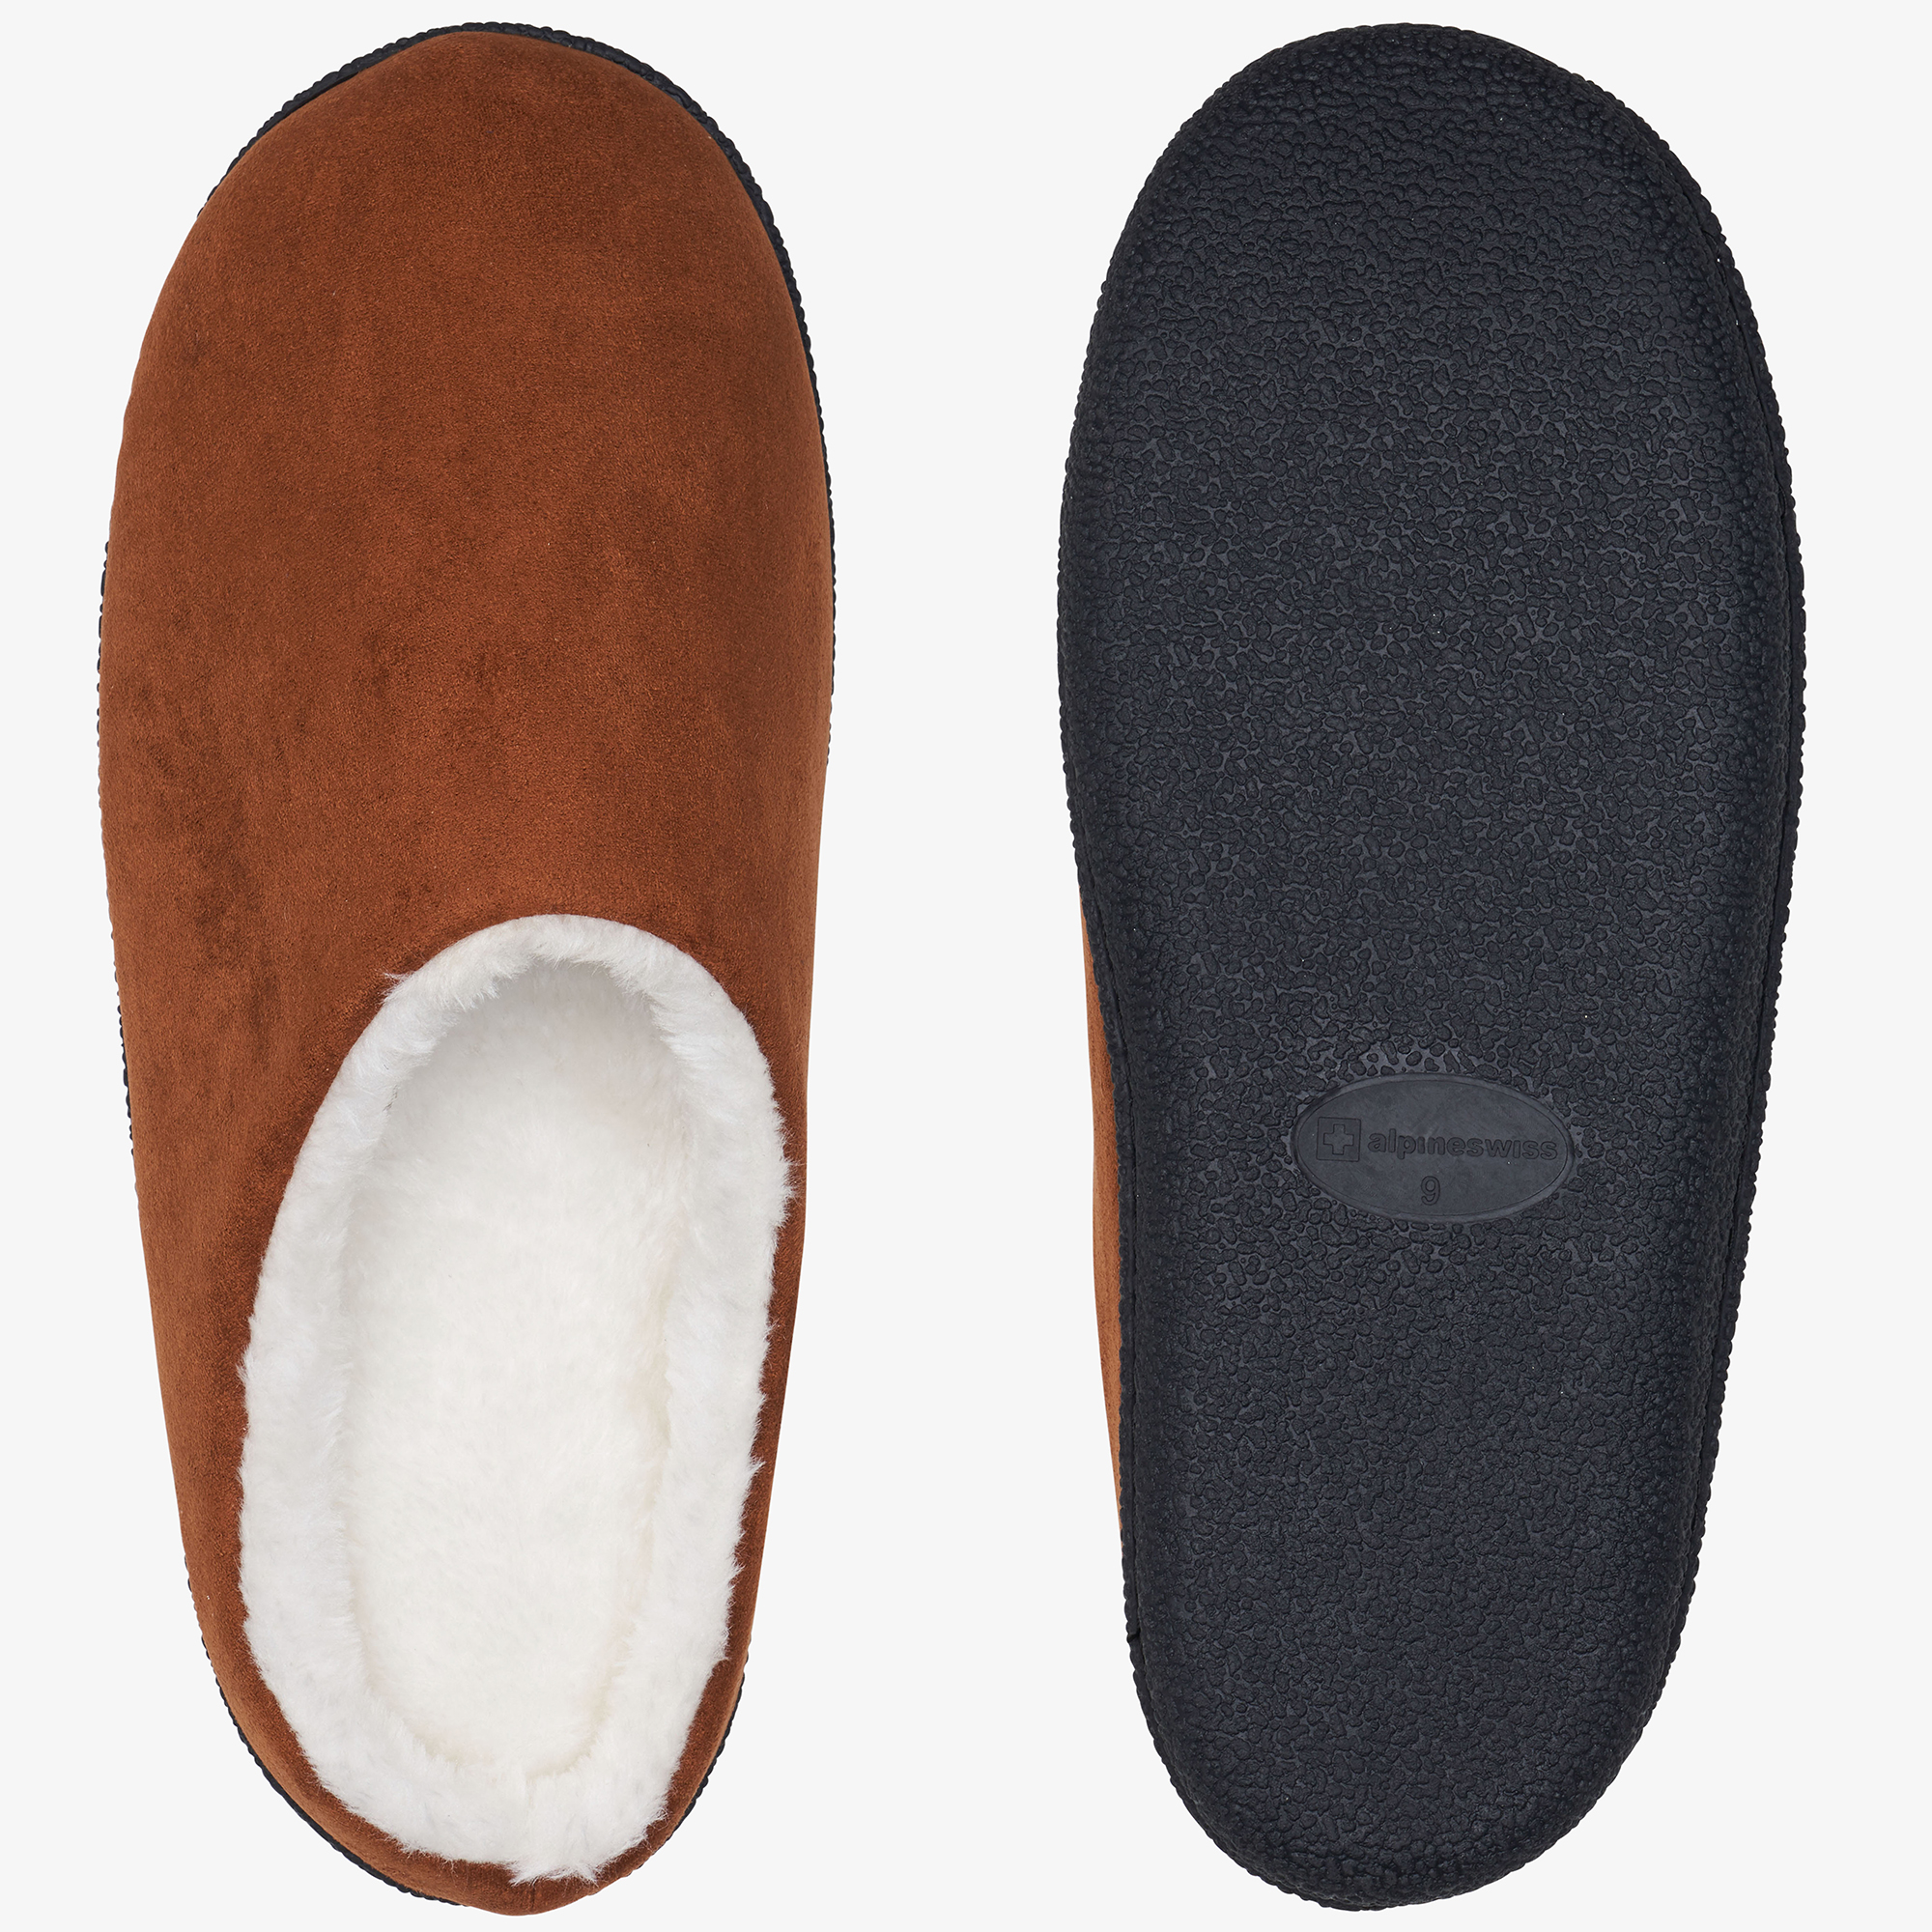 Alpine-Swiss-Mens-Memory-Foam-Clog-Slippers-Indoor-Comfort-Slip-On-House-Shoes thumbnail 22